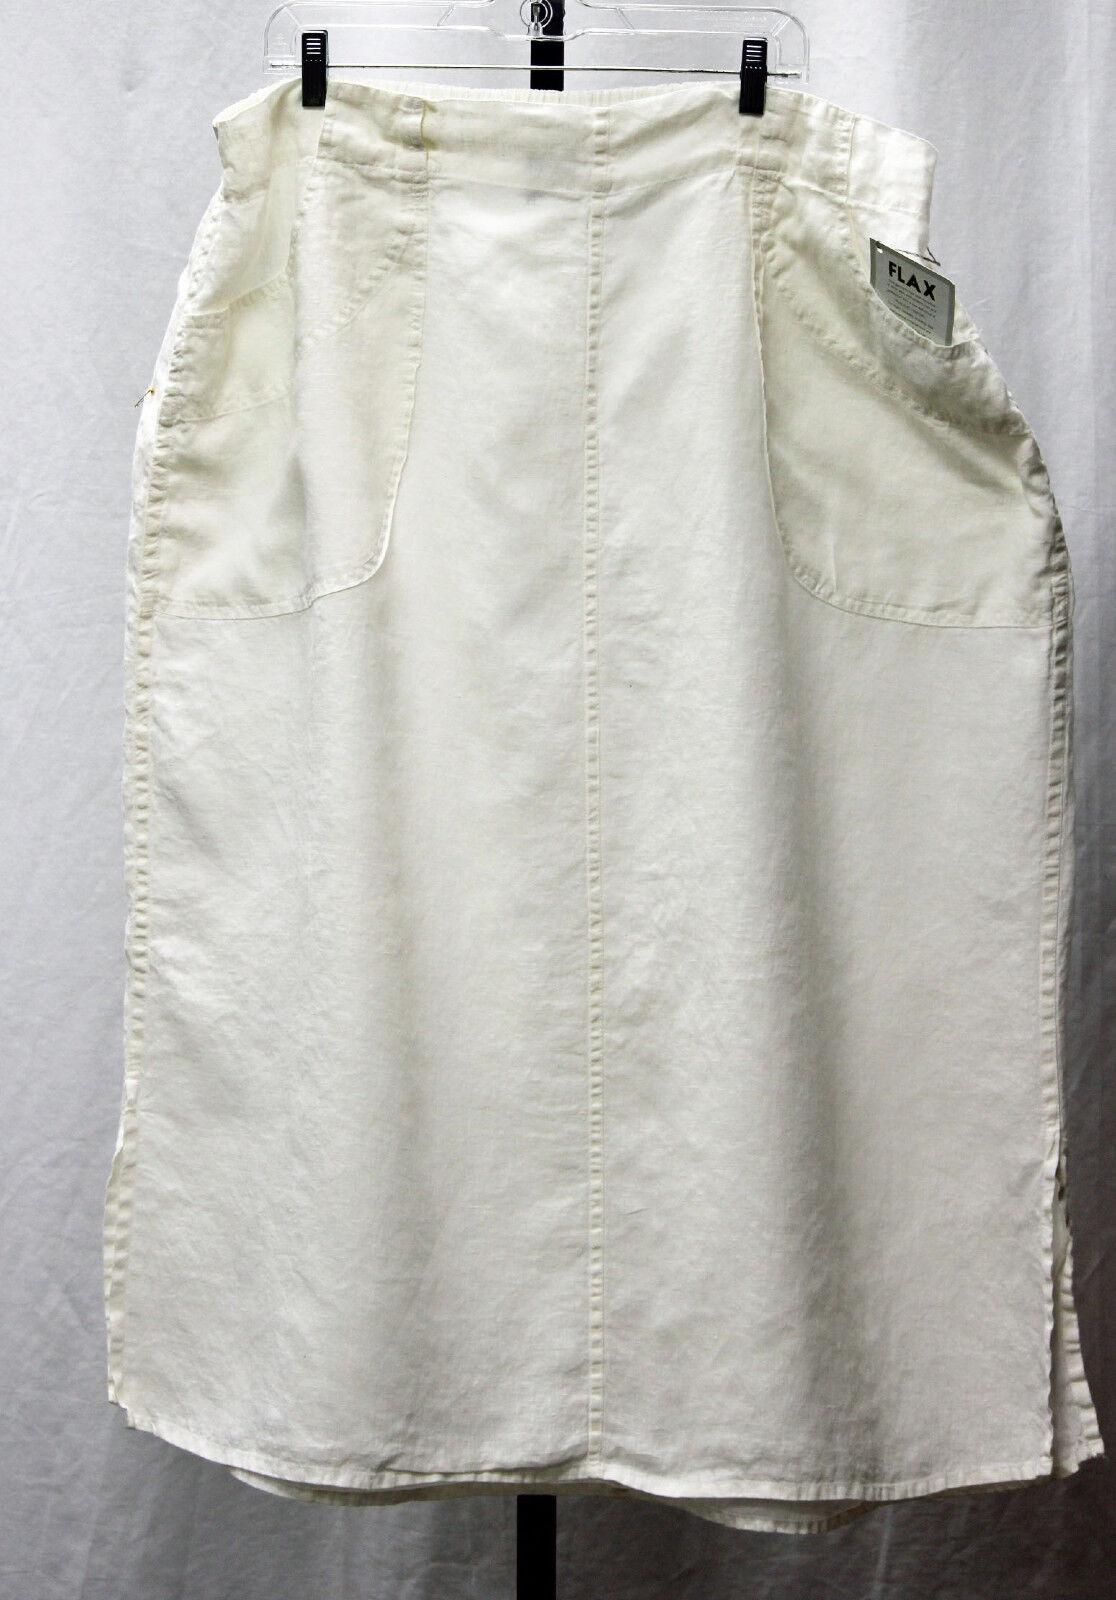 NWT FLAX Neutral Street Skirt in Milk Hanky weight linen Size 3G